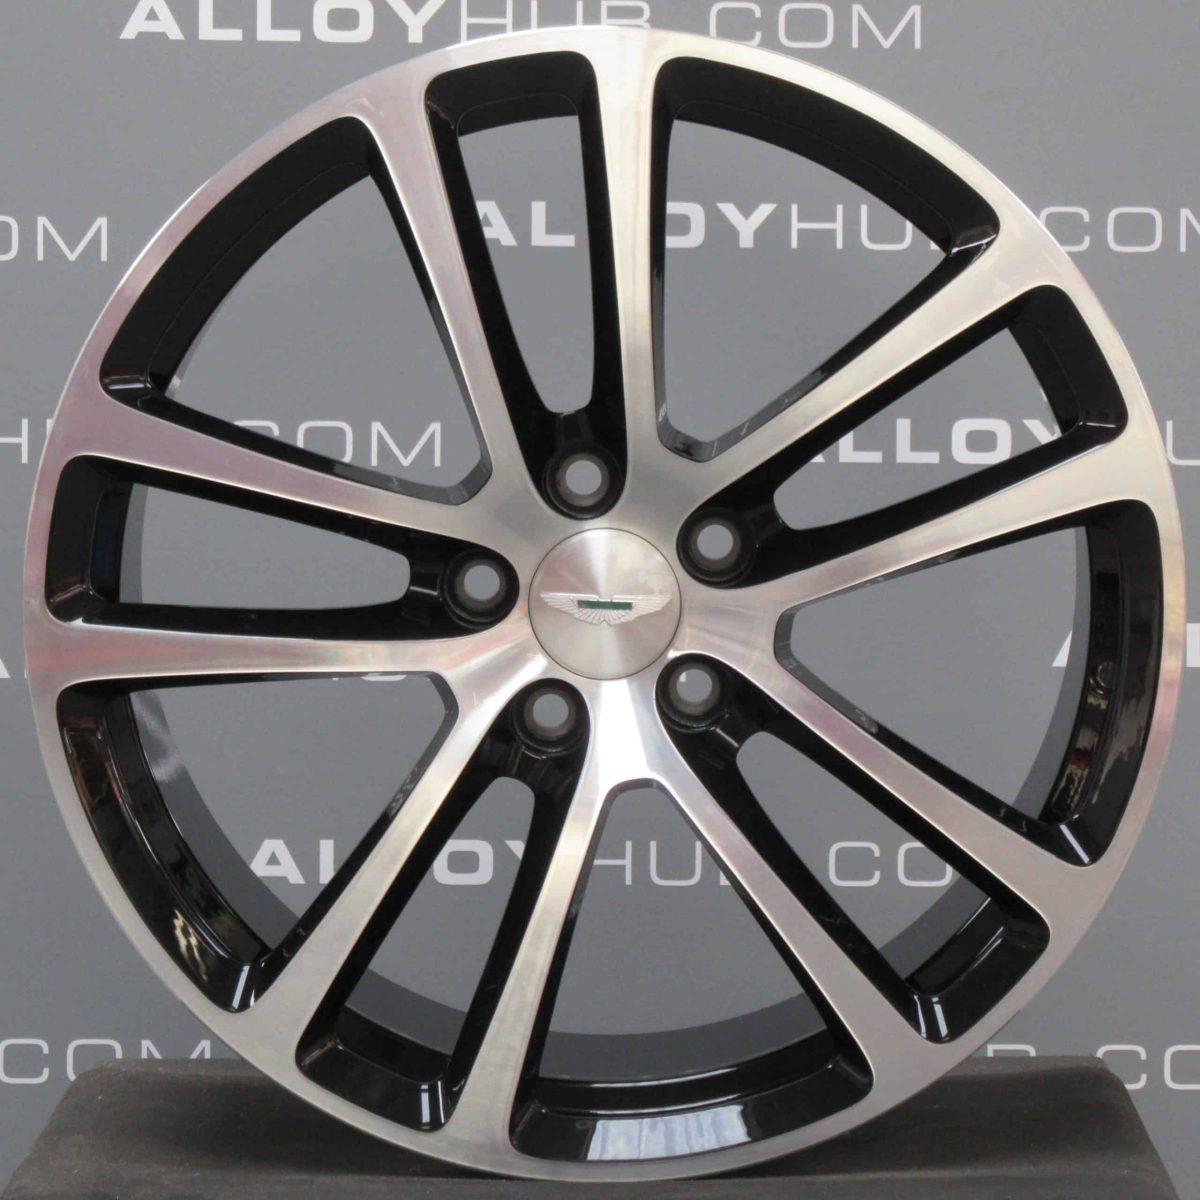 "Genuine Aston Martin DB9 5 Twin Spoke Forged 19"" Inch Alloy Wheels with Black & Diamond Turned Finish AG43-1007-JA, AG43-1007-KA"